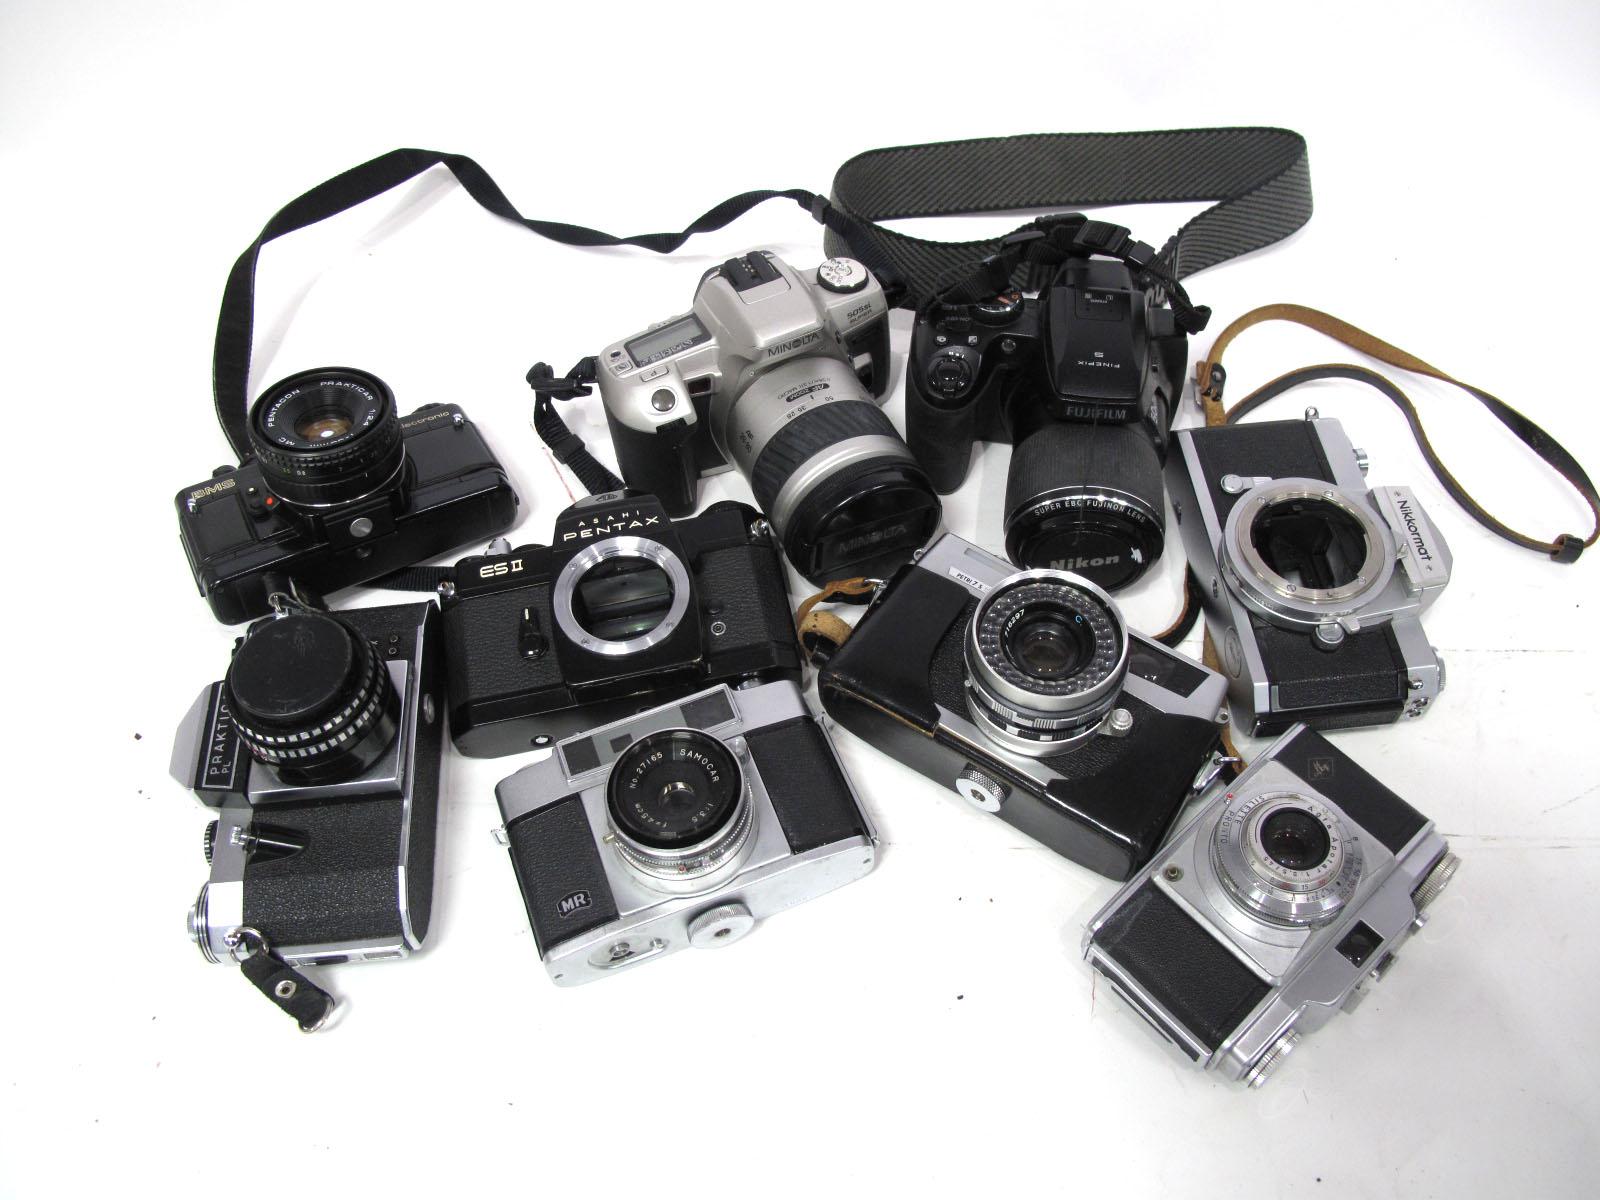 Praktica Noval with Meyer-Optik Gorlitz 2.8/50 Lens, Praktica Electronic with Pentacon Praktica 1: